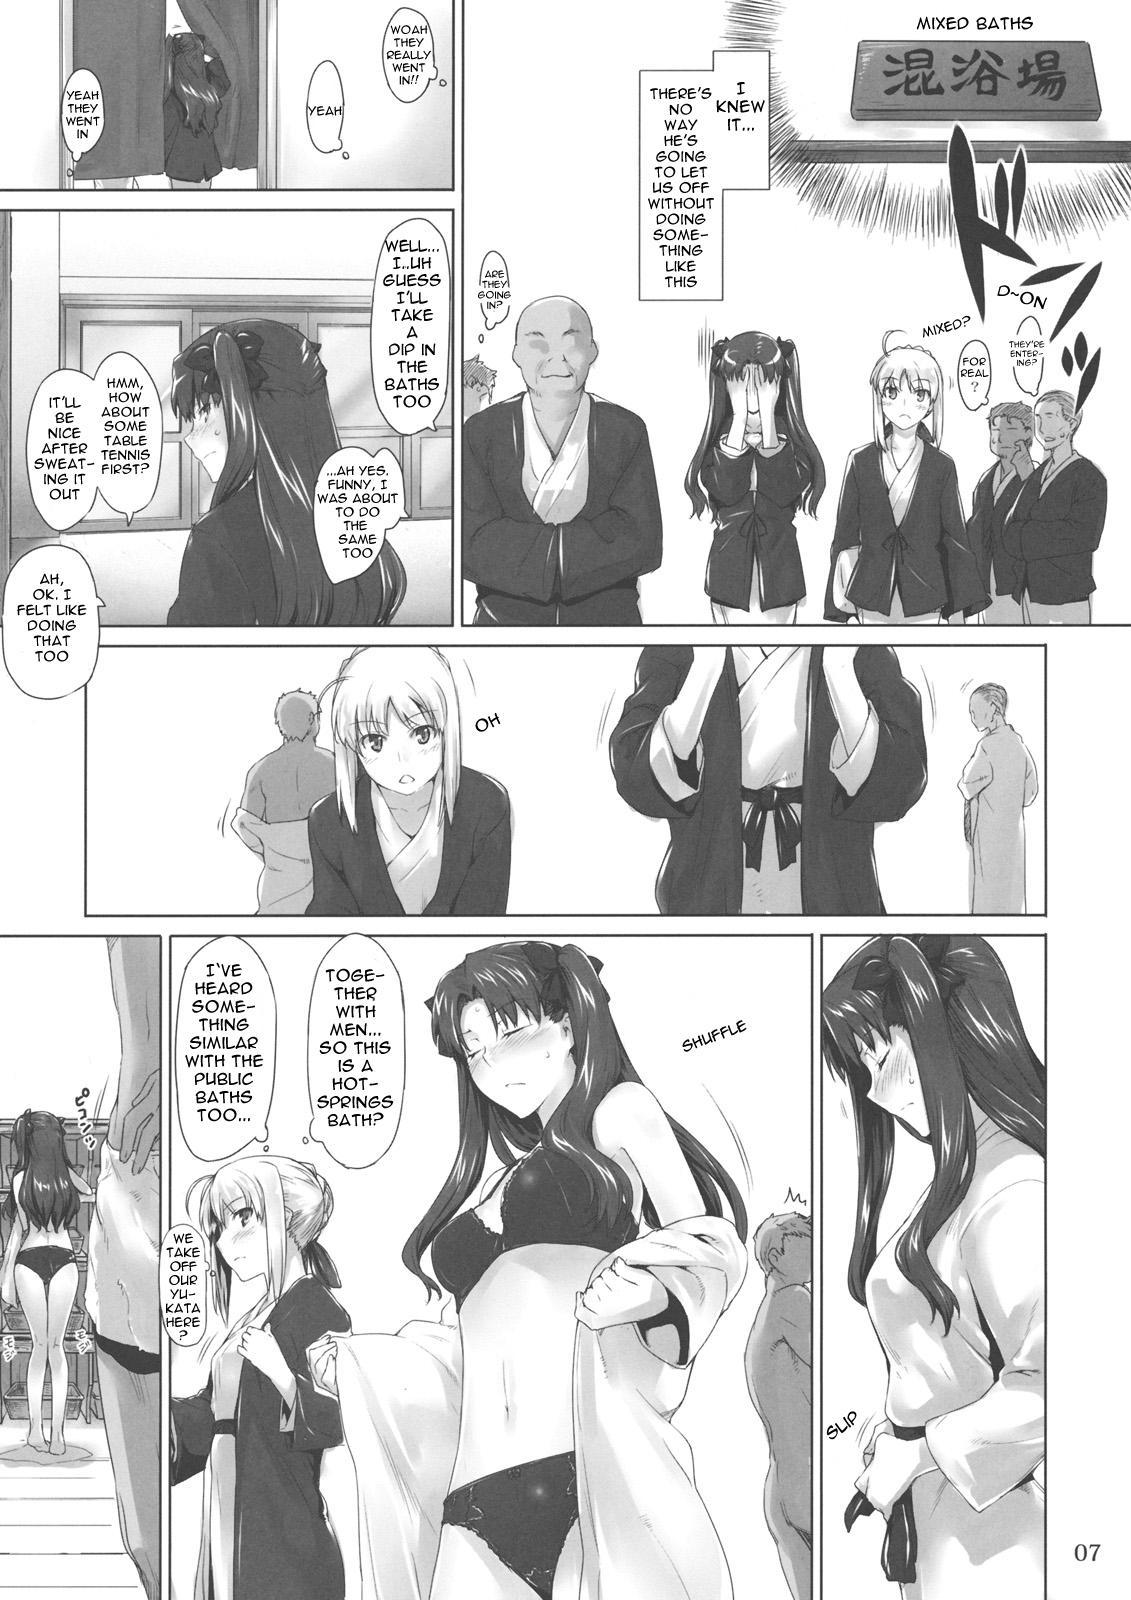 Tosaka-ke no Kakei Jijou 8 5